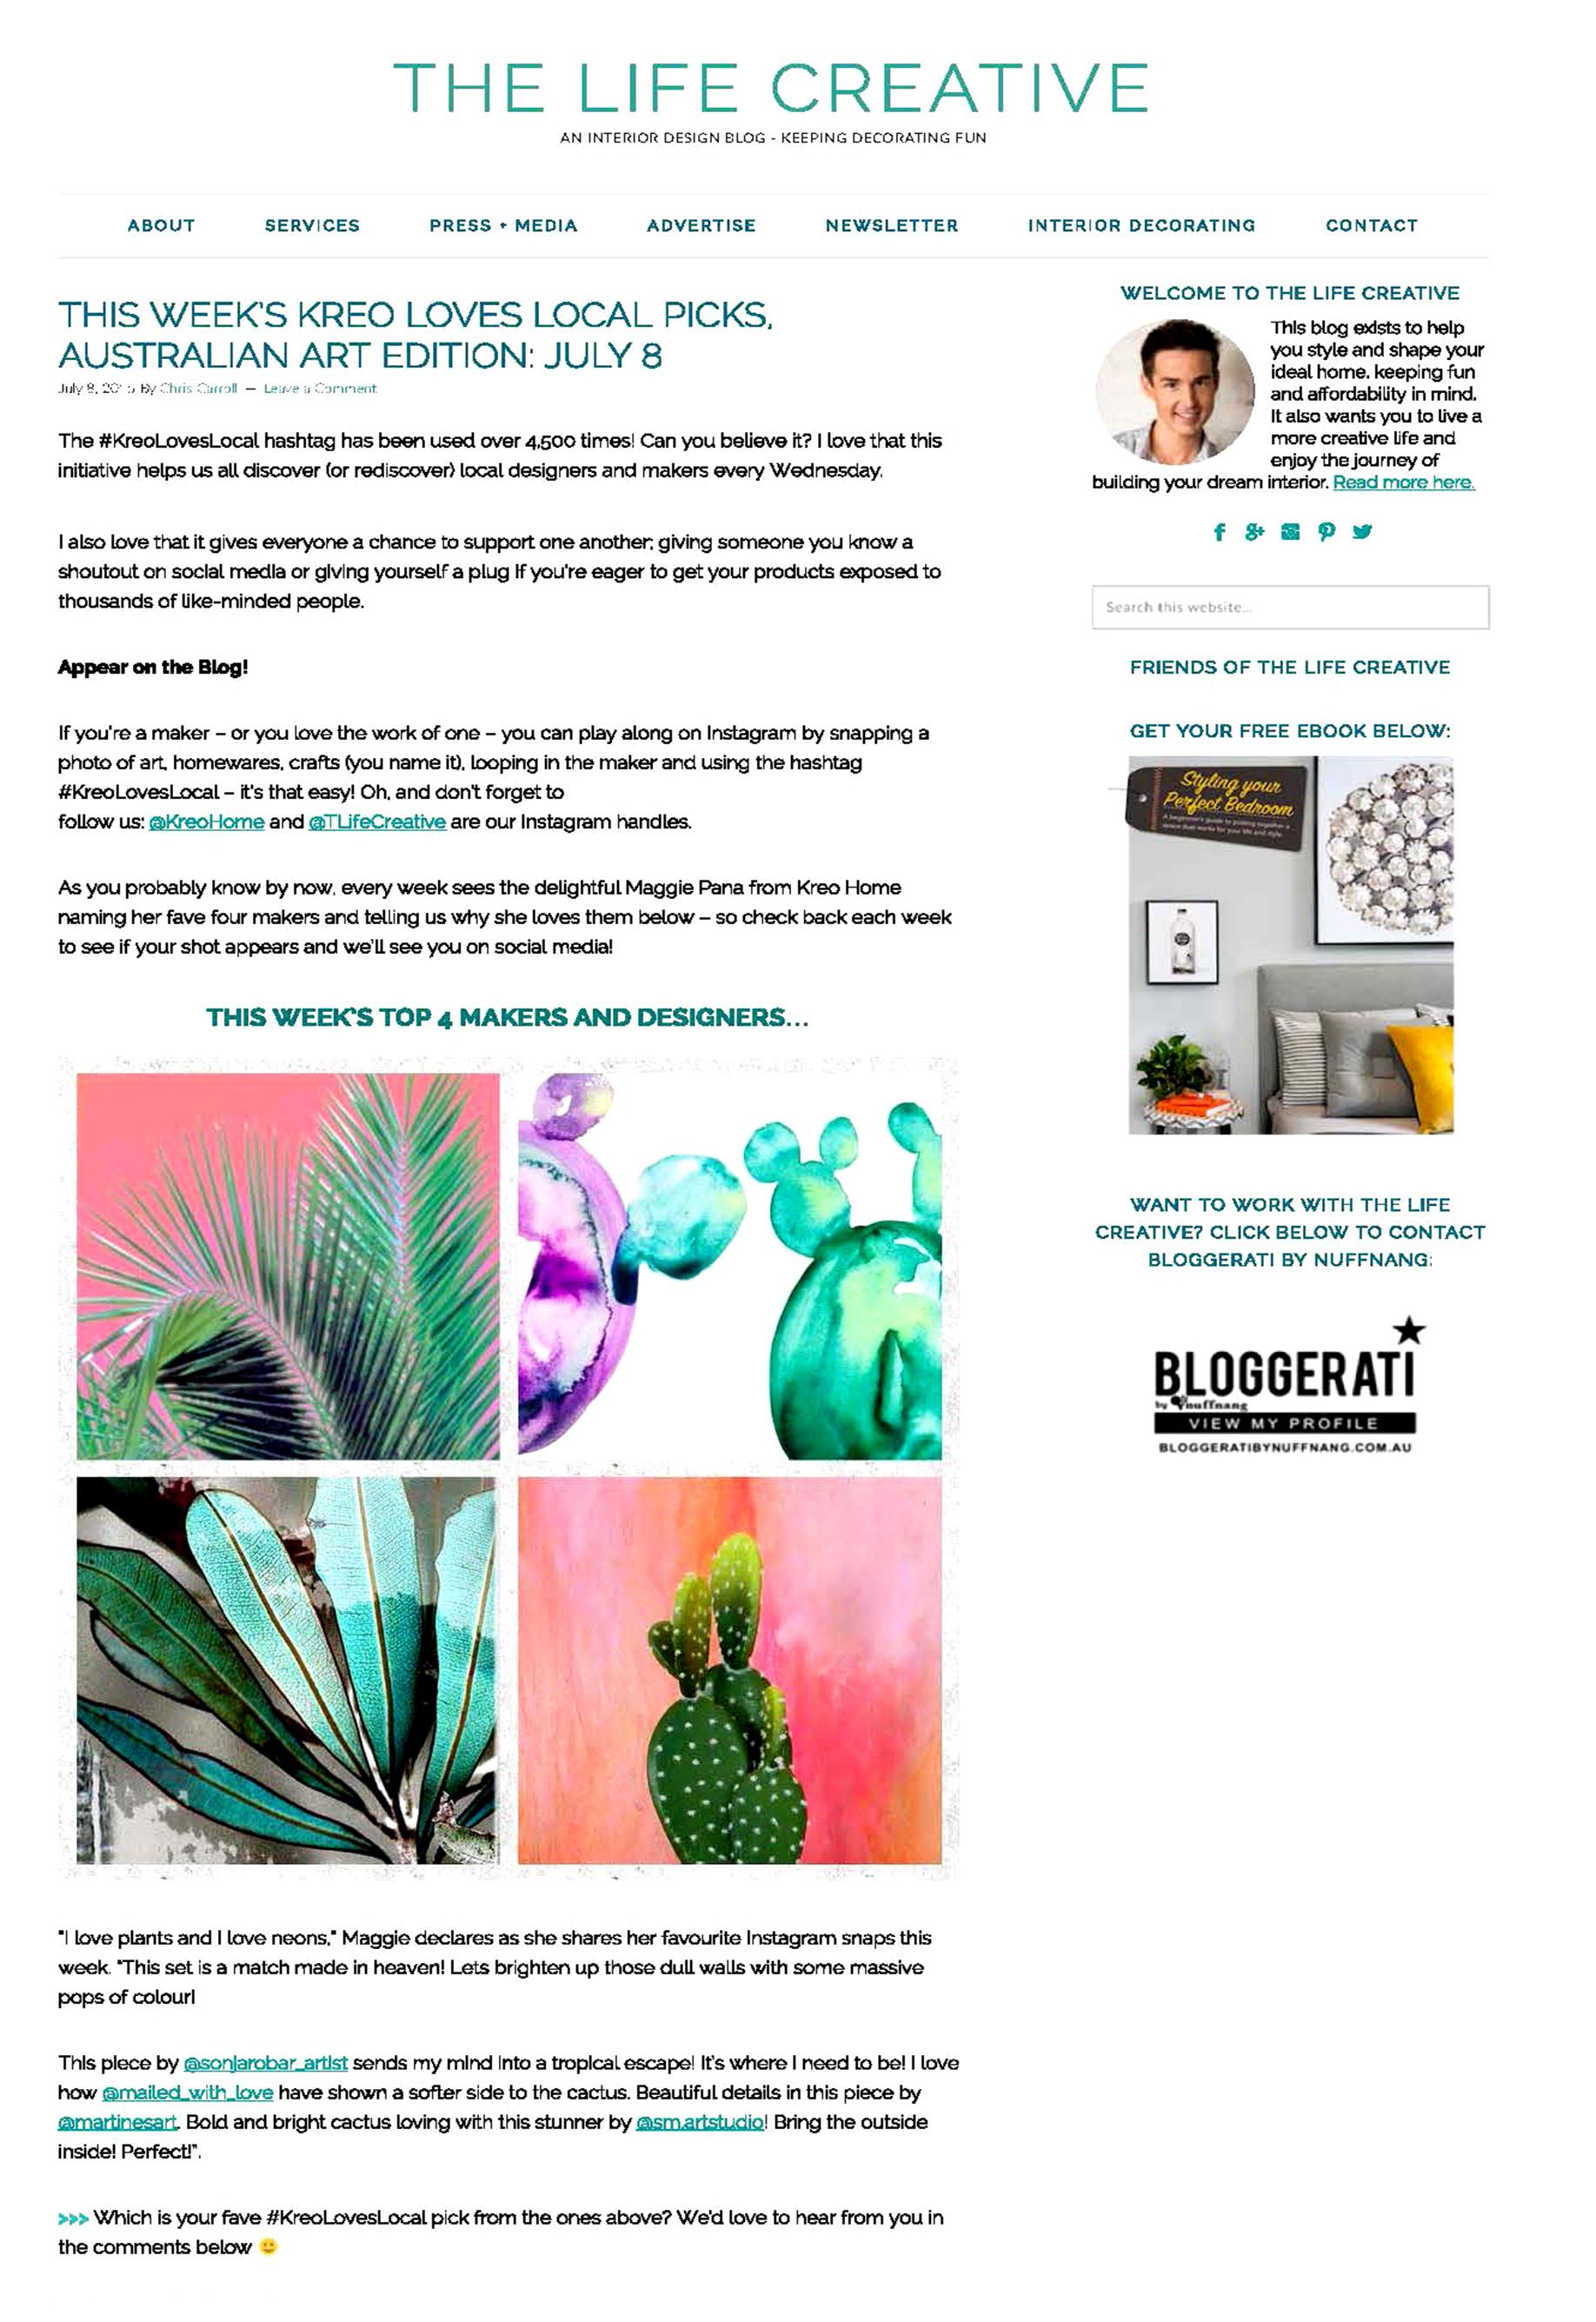 USE 4 Australian Artists you need to follow _ THE LIFE CREATIVE_Page_1 v2.jpg